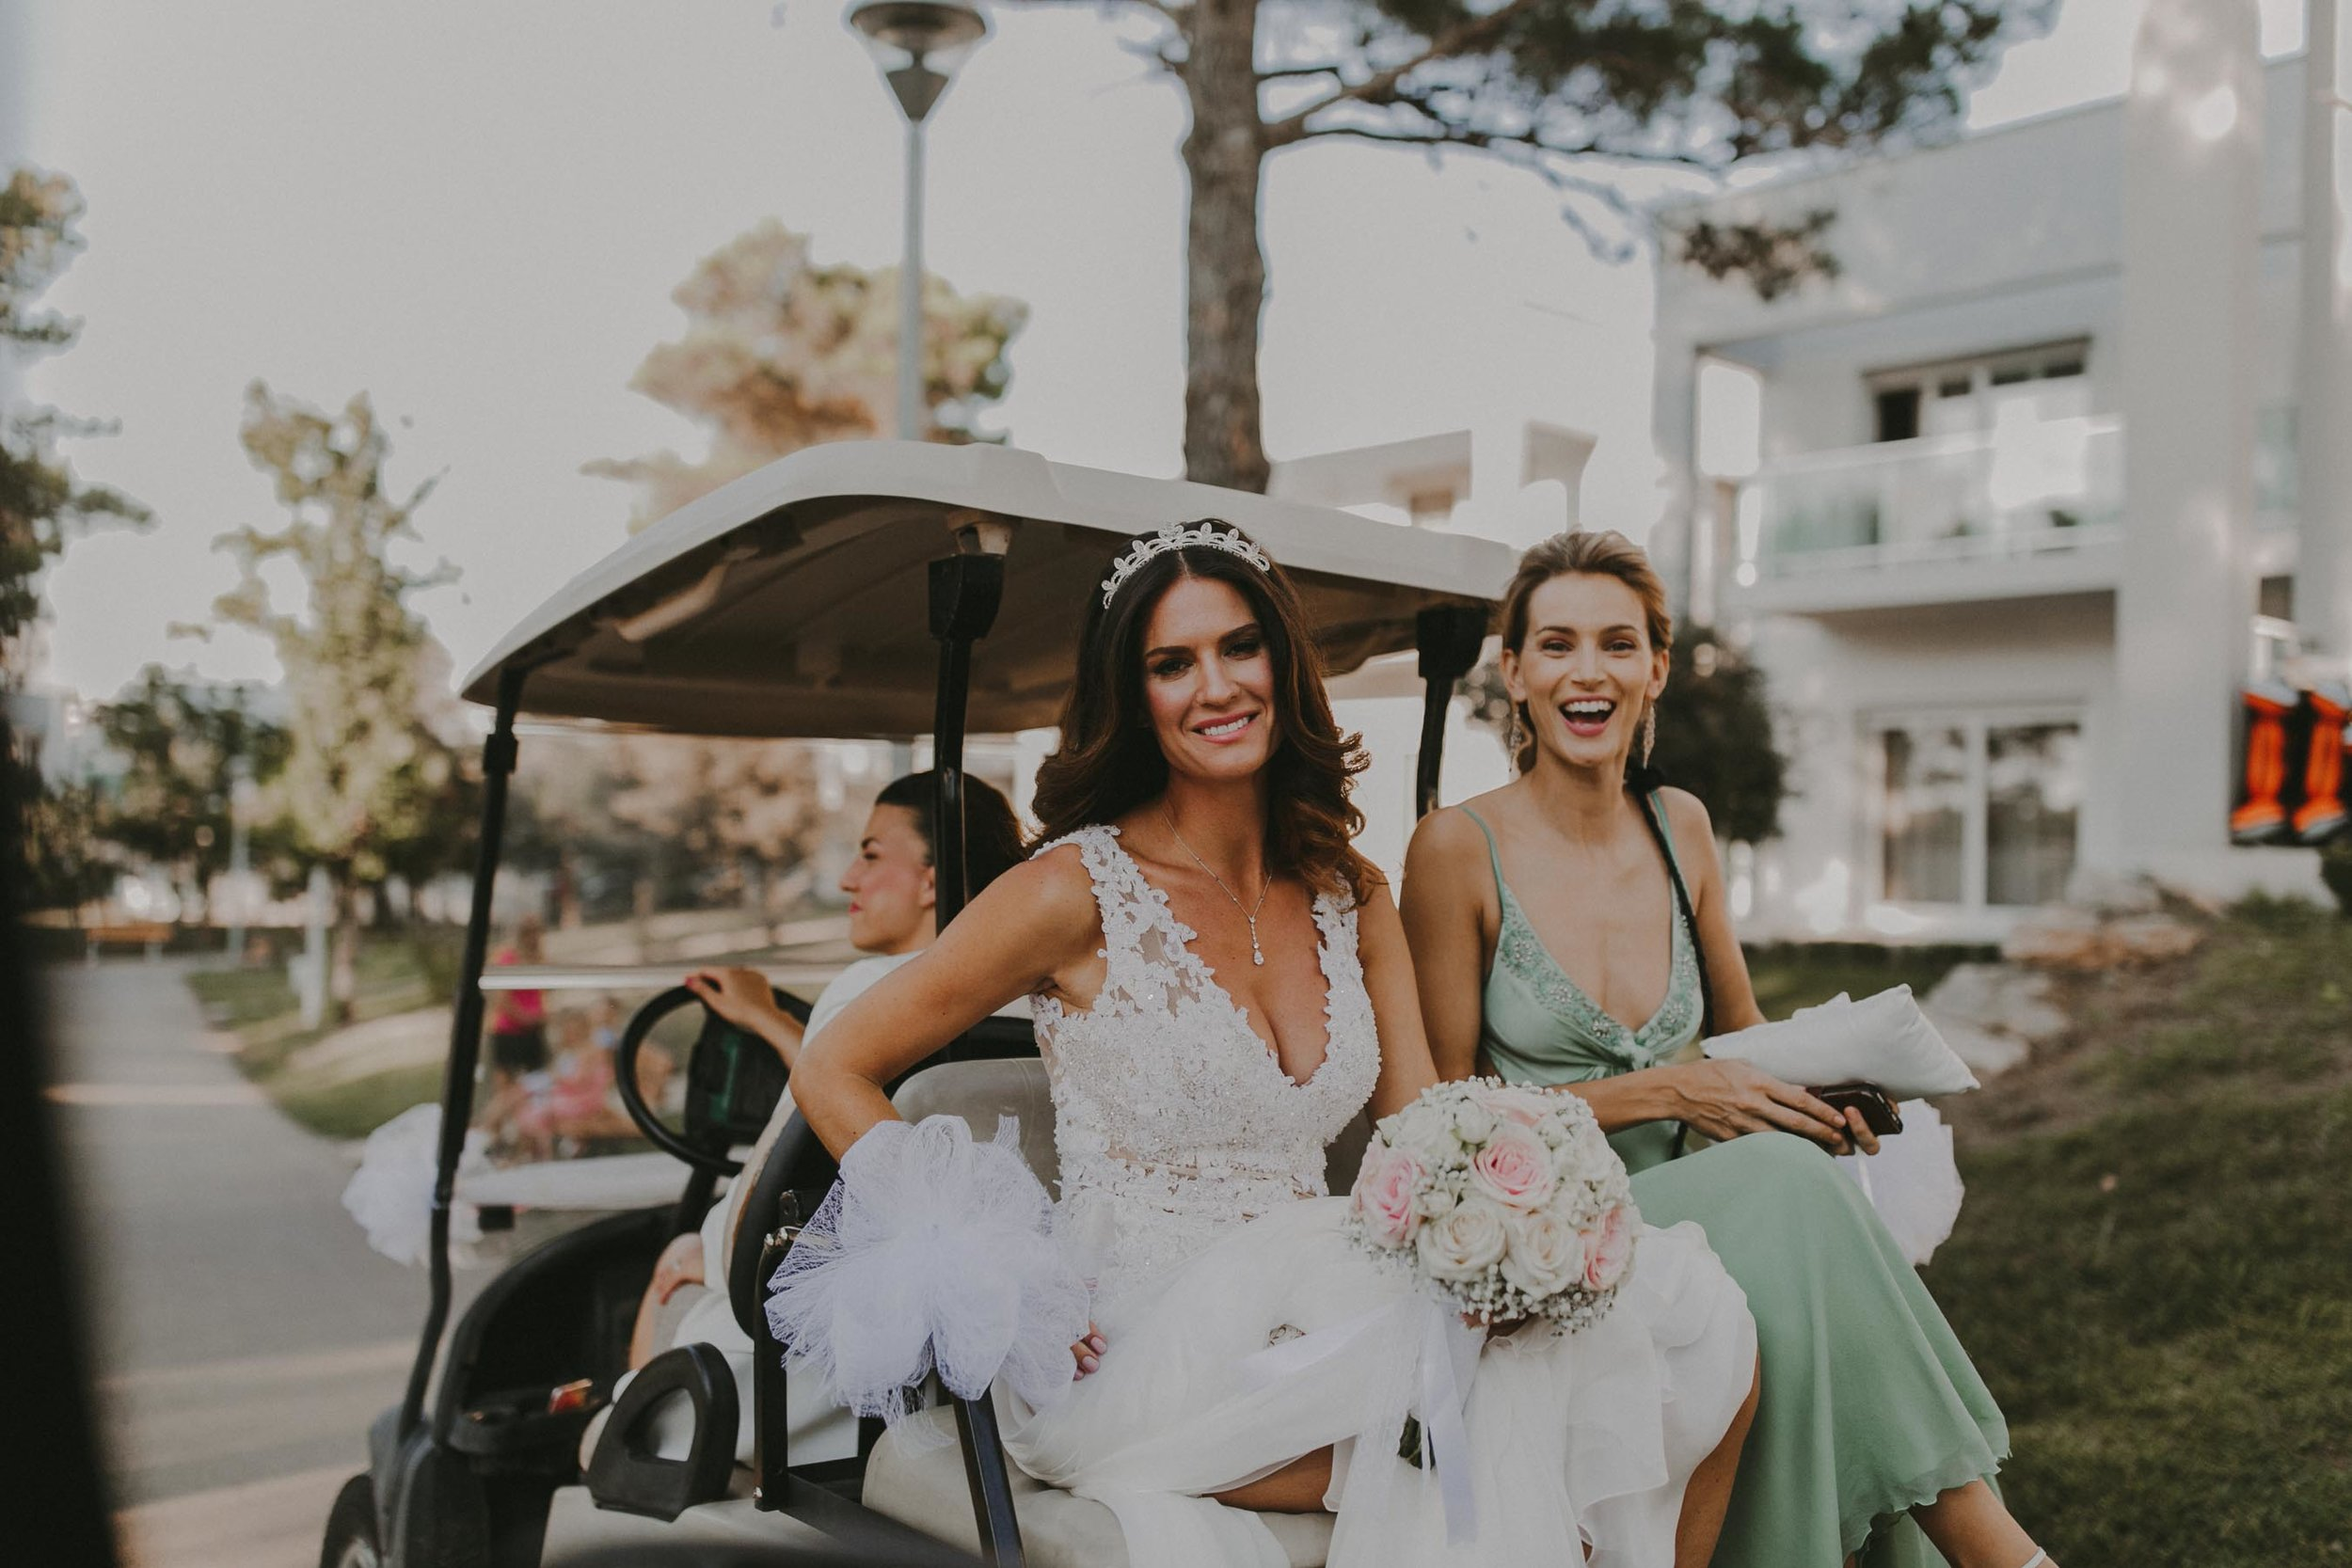 sylvia&dimitri-Wedding-Crvena_Luka-Croatia-36(7666).jpg